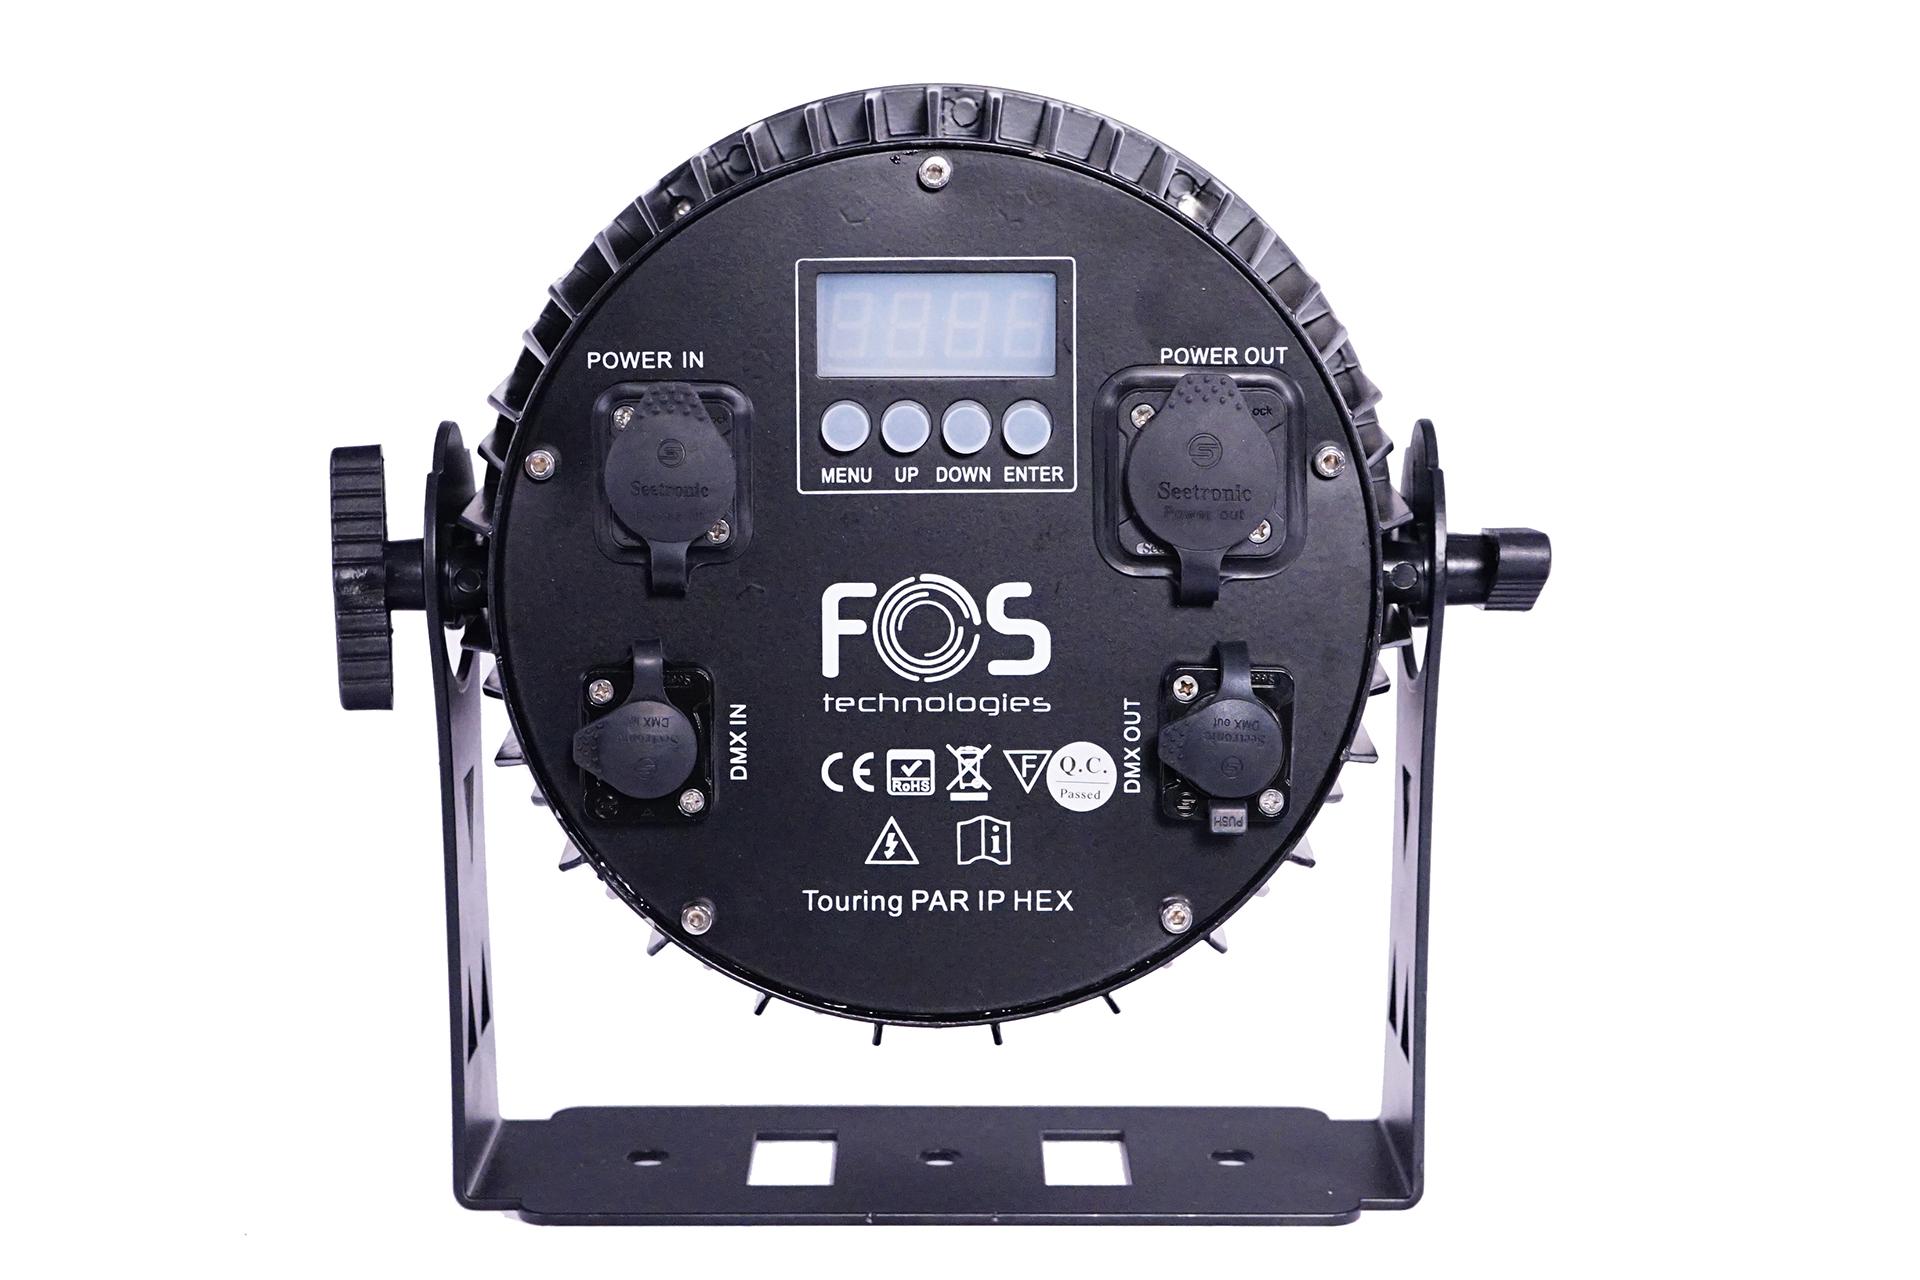 FOS-Touring-PAR-IP-HEX_2.jpg